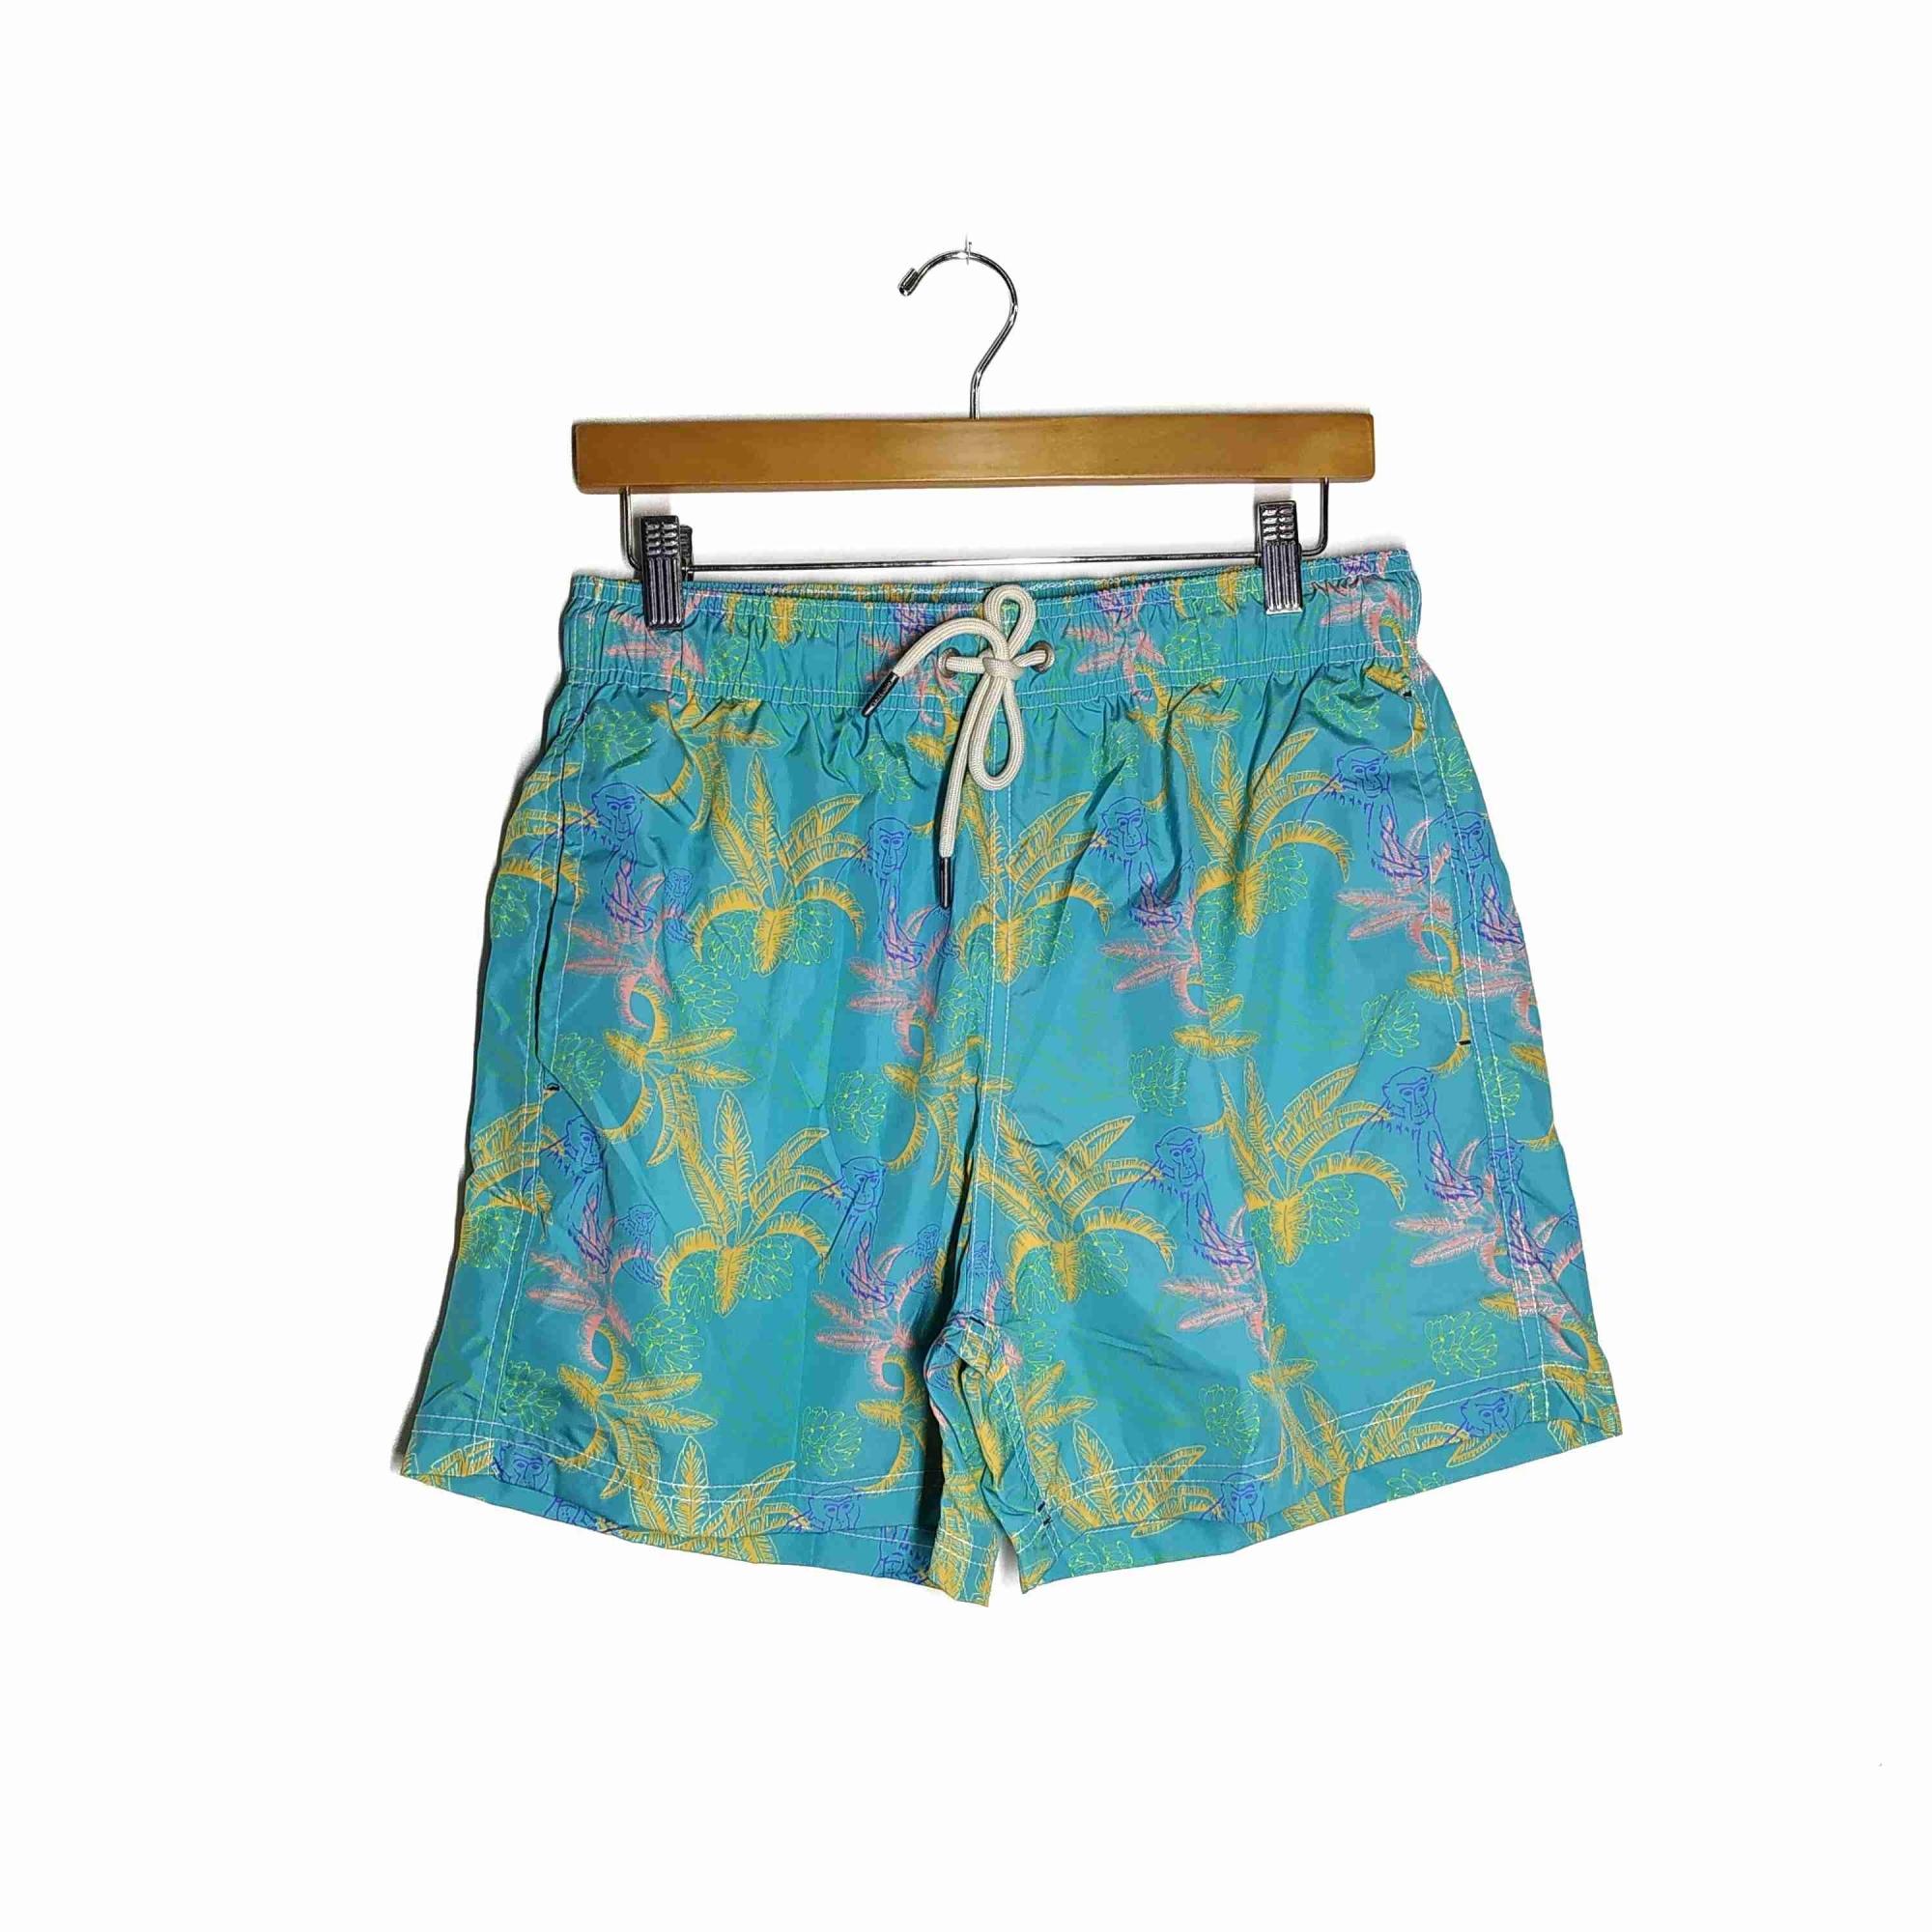 Shorts Co Shorts Especial Regular Macaco Neon Adulto